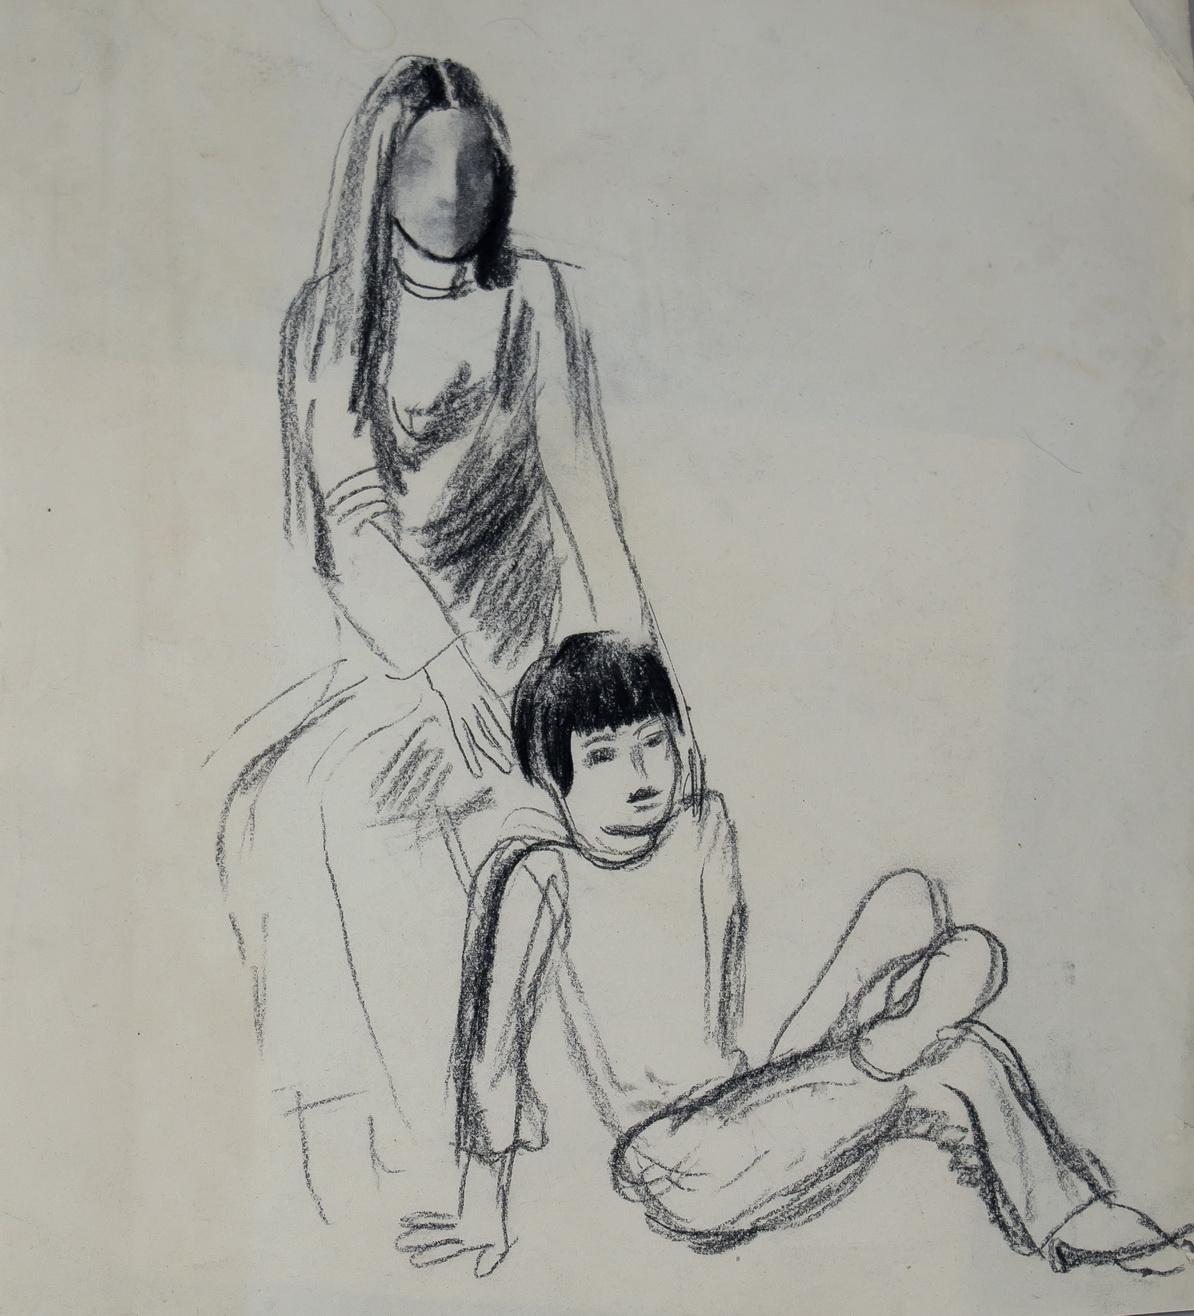 "Межберг Лев: Жанровая картина ""Женщина с ребенком"""